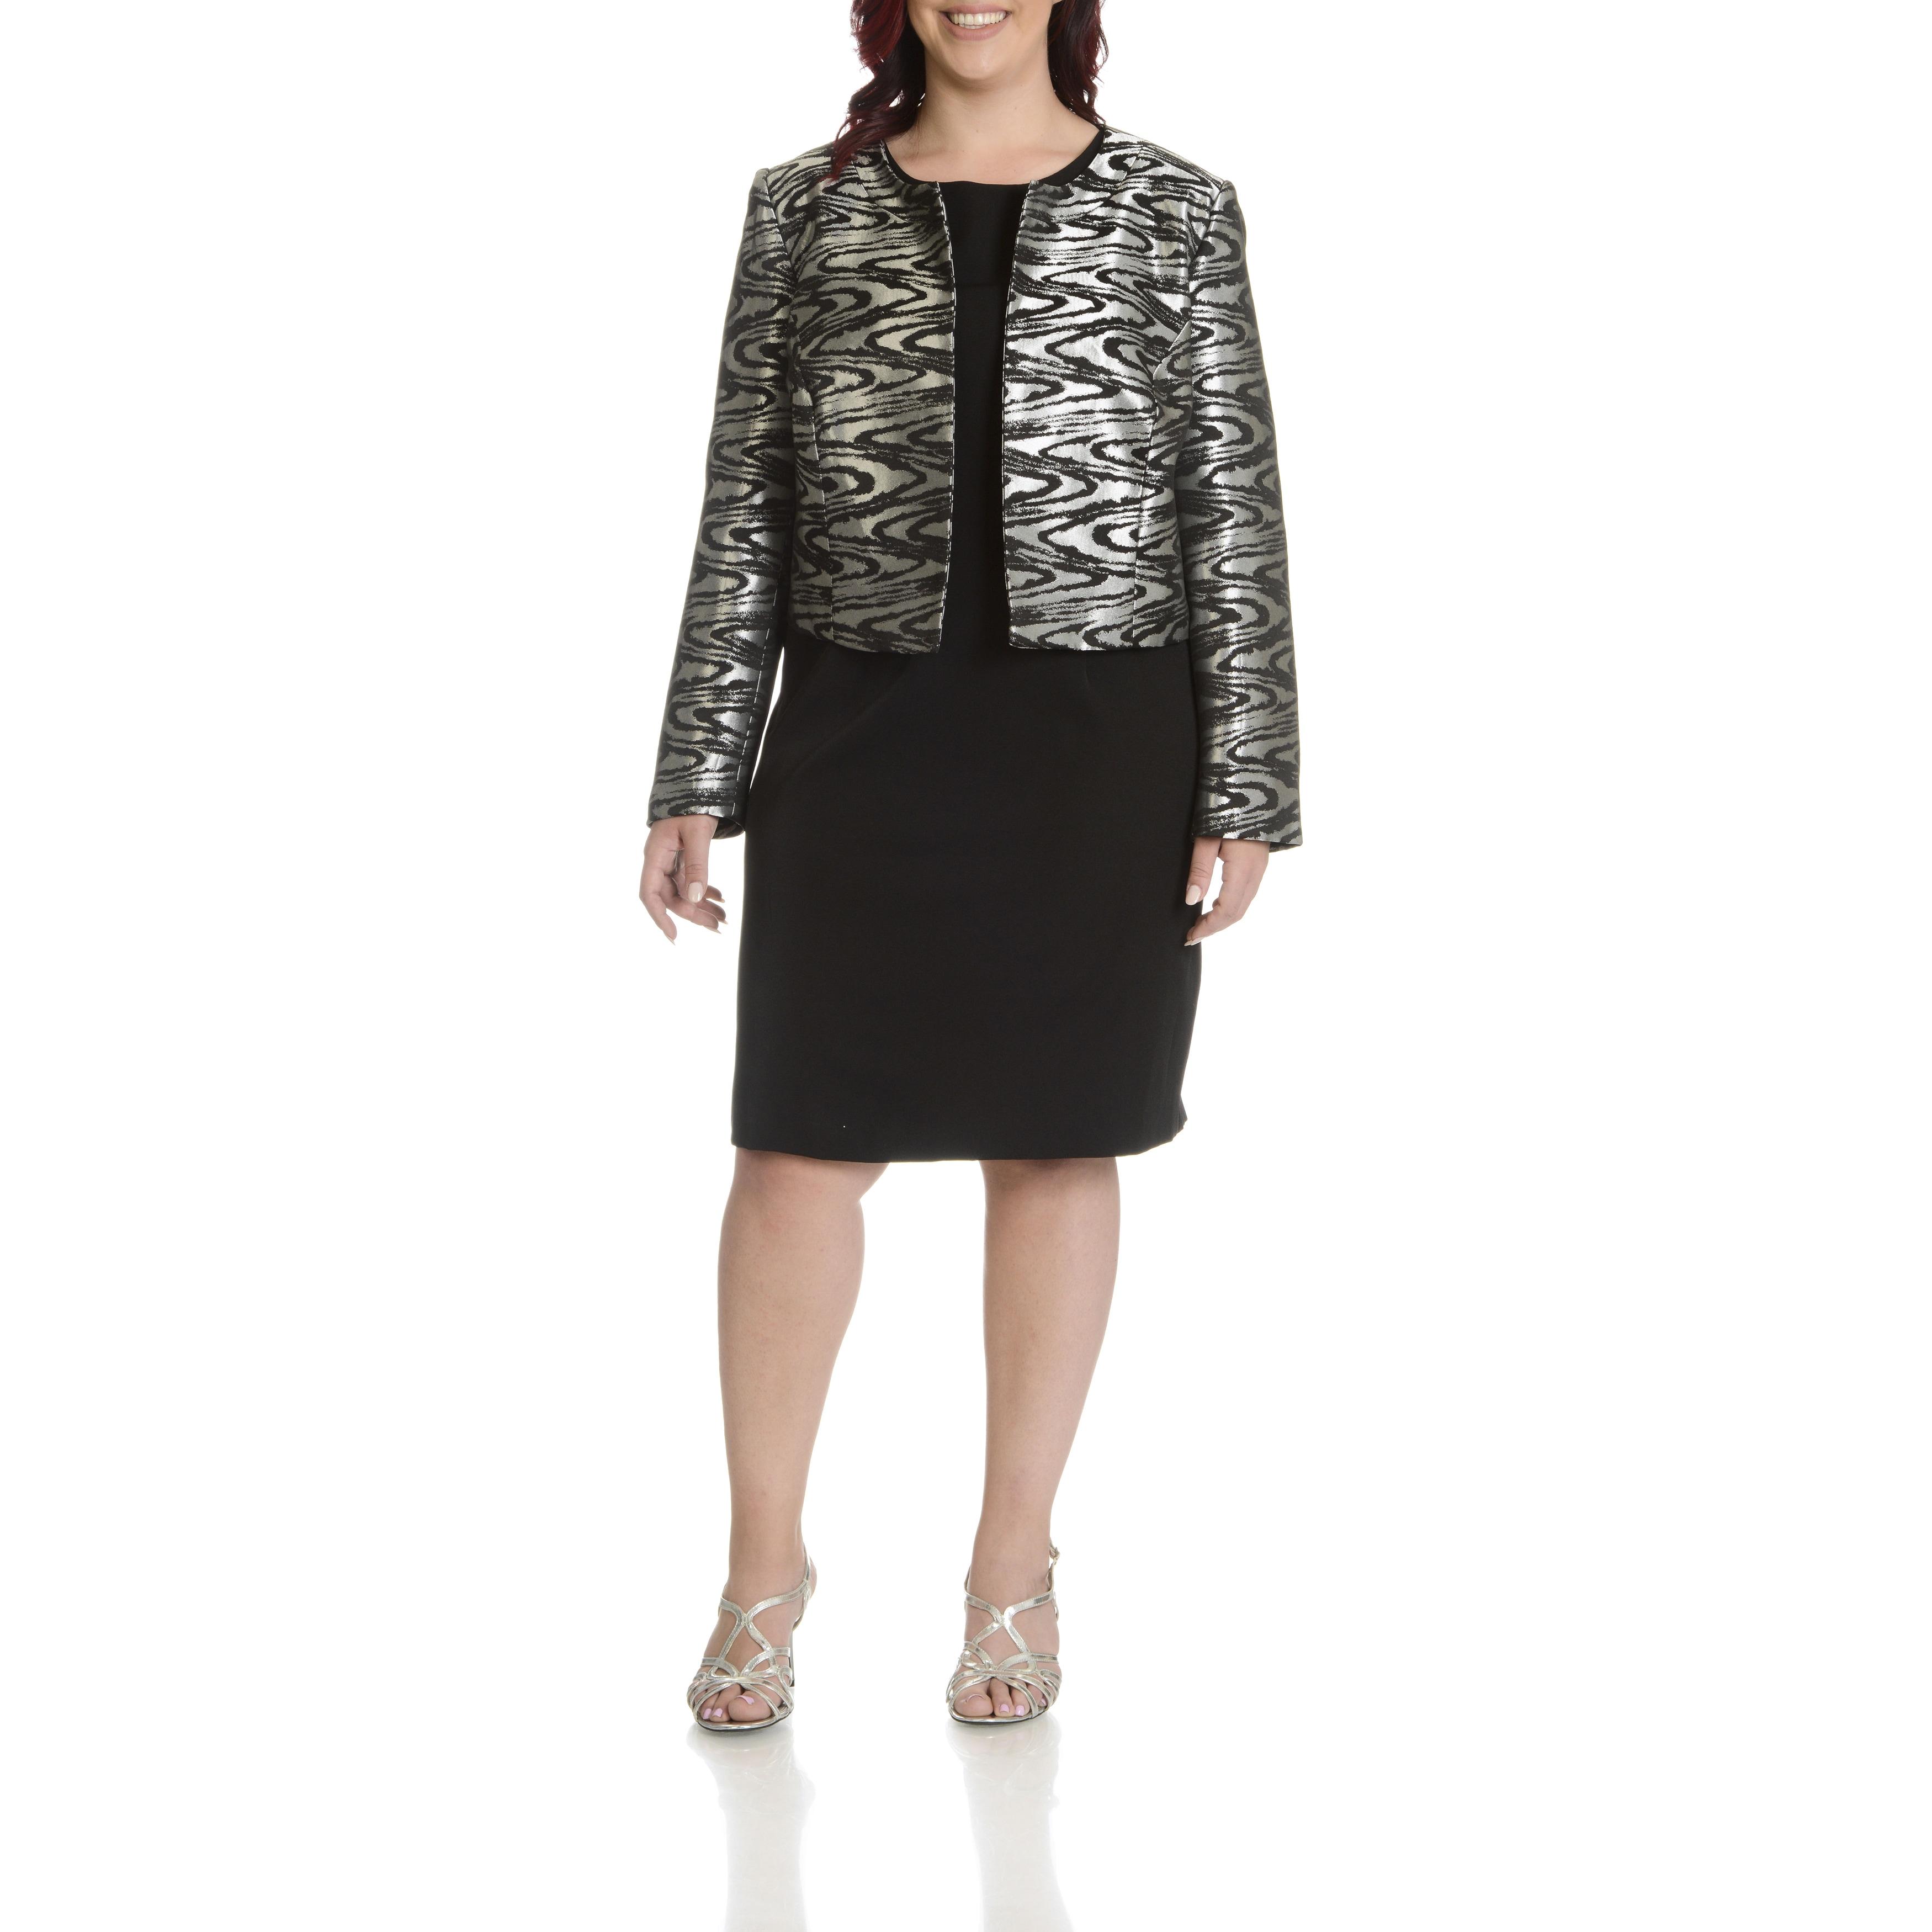 Shop Danillo Women S Plus Size Printed Metallic Dress Suit Free